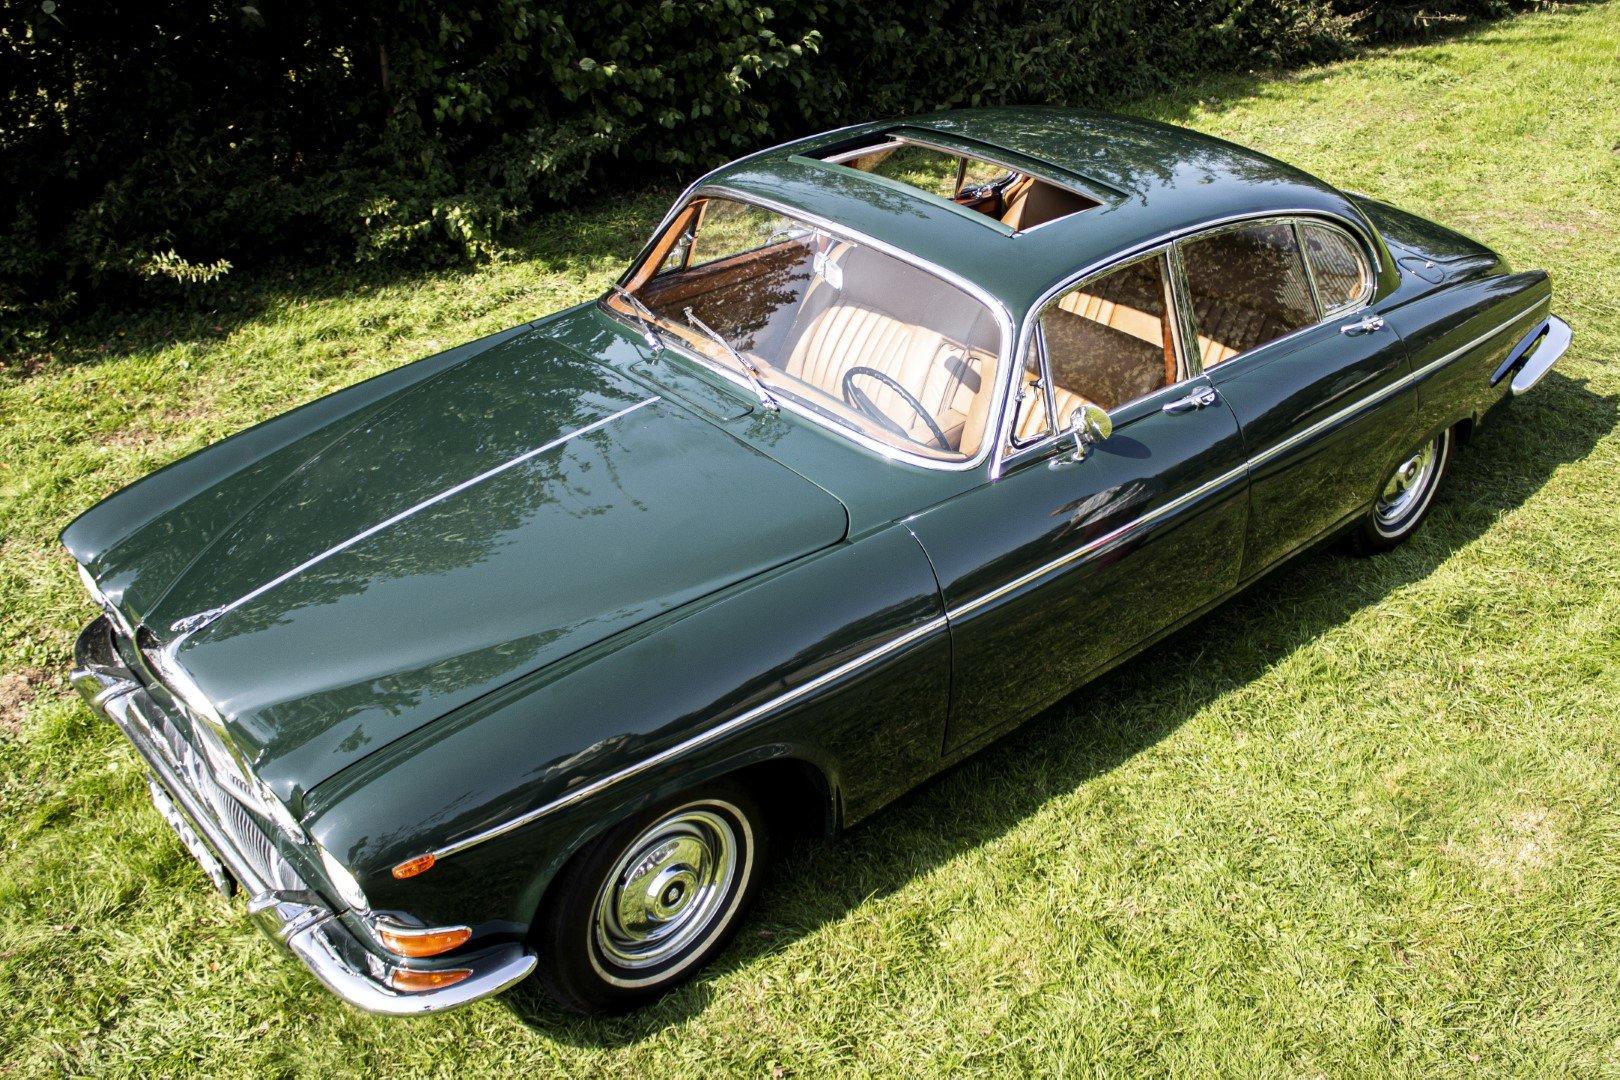 Jaguar MK10 420G 1966 6 cyl. 4.2L For Sale | Car And Classic